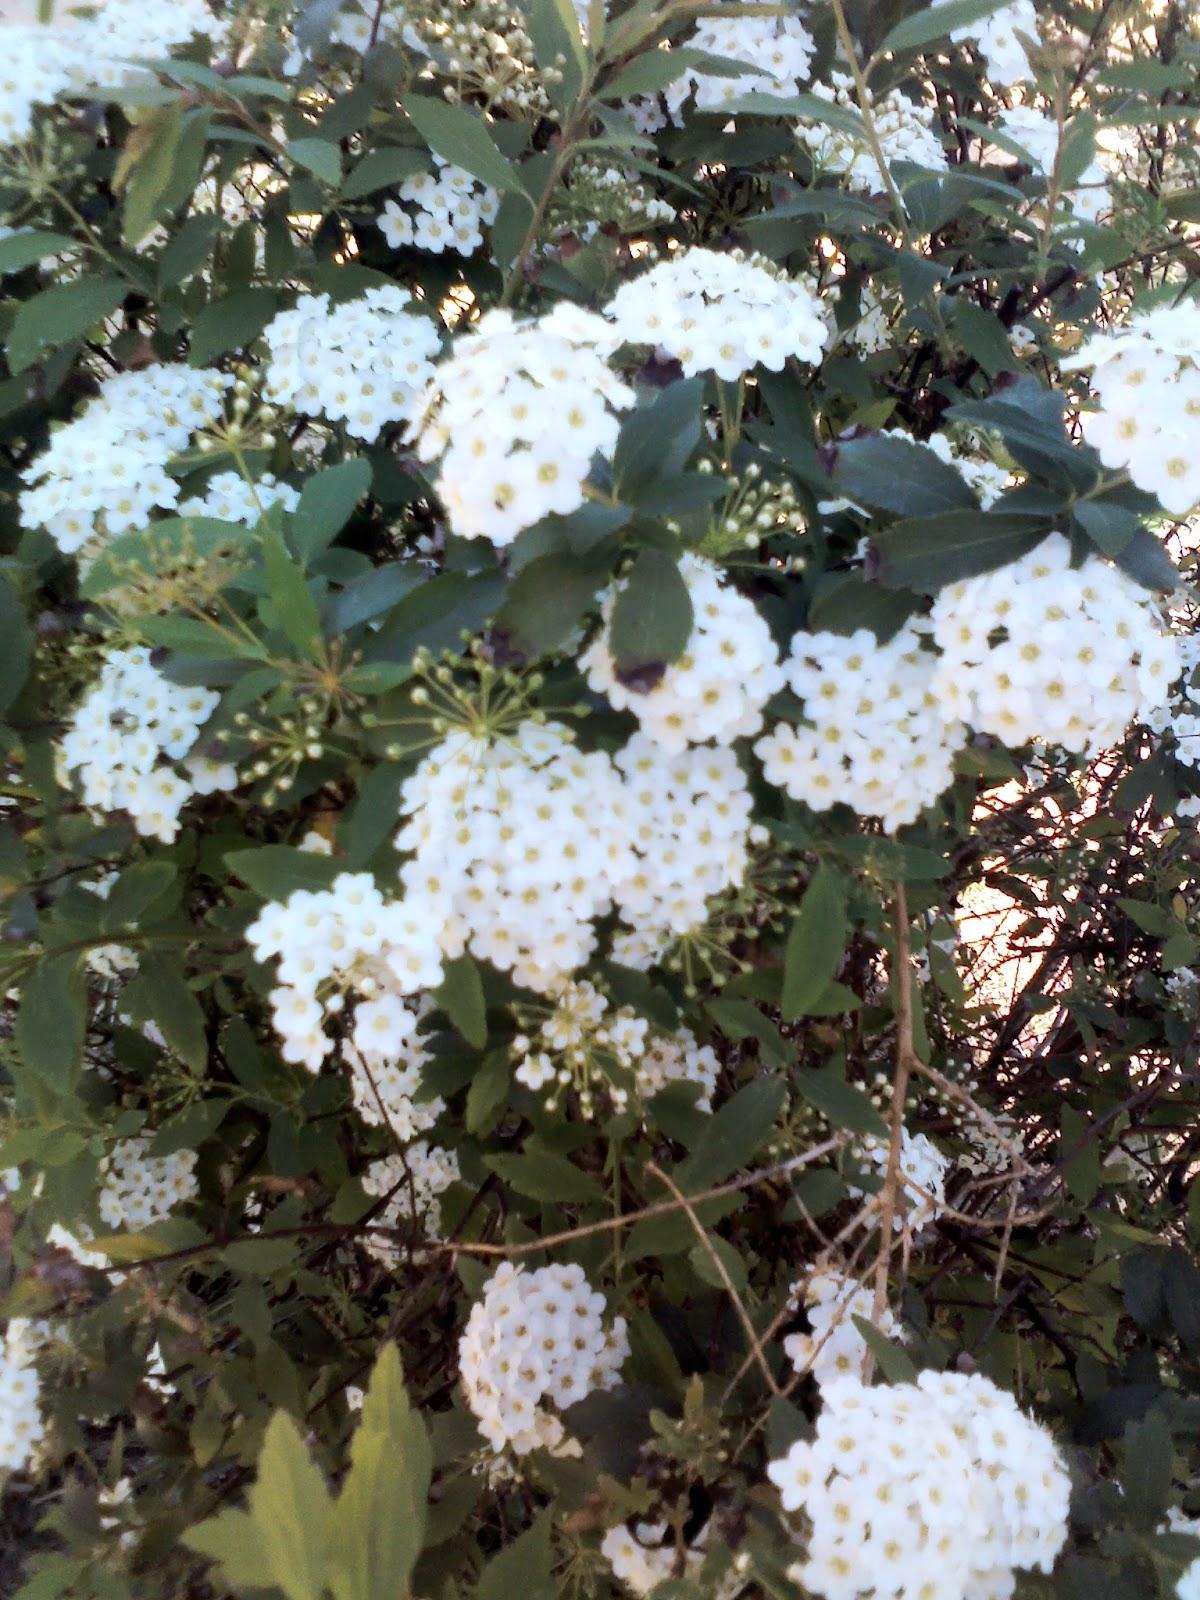 Primavera flores blancas